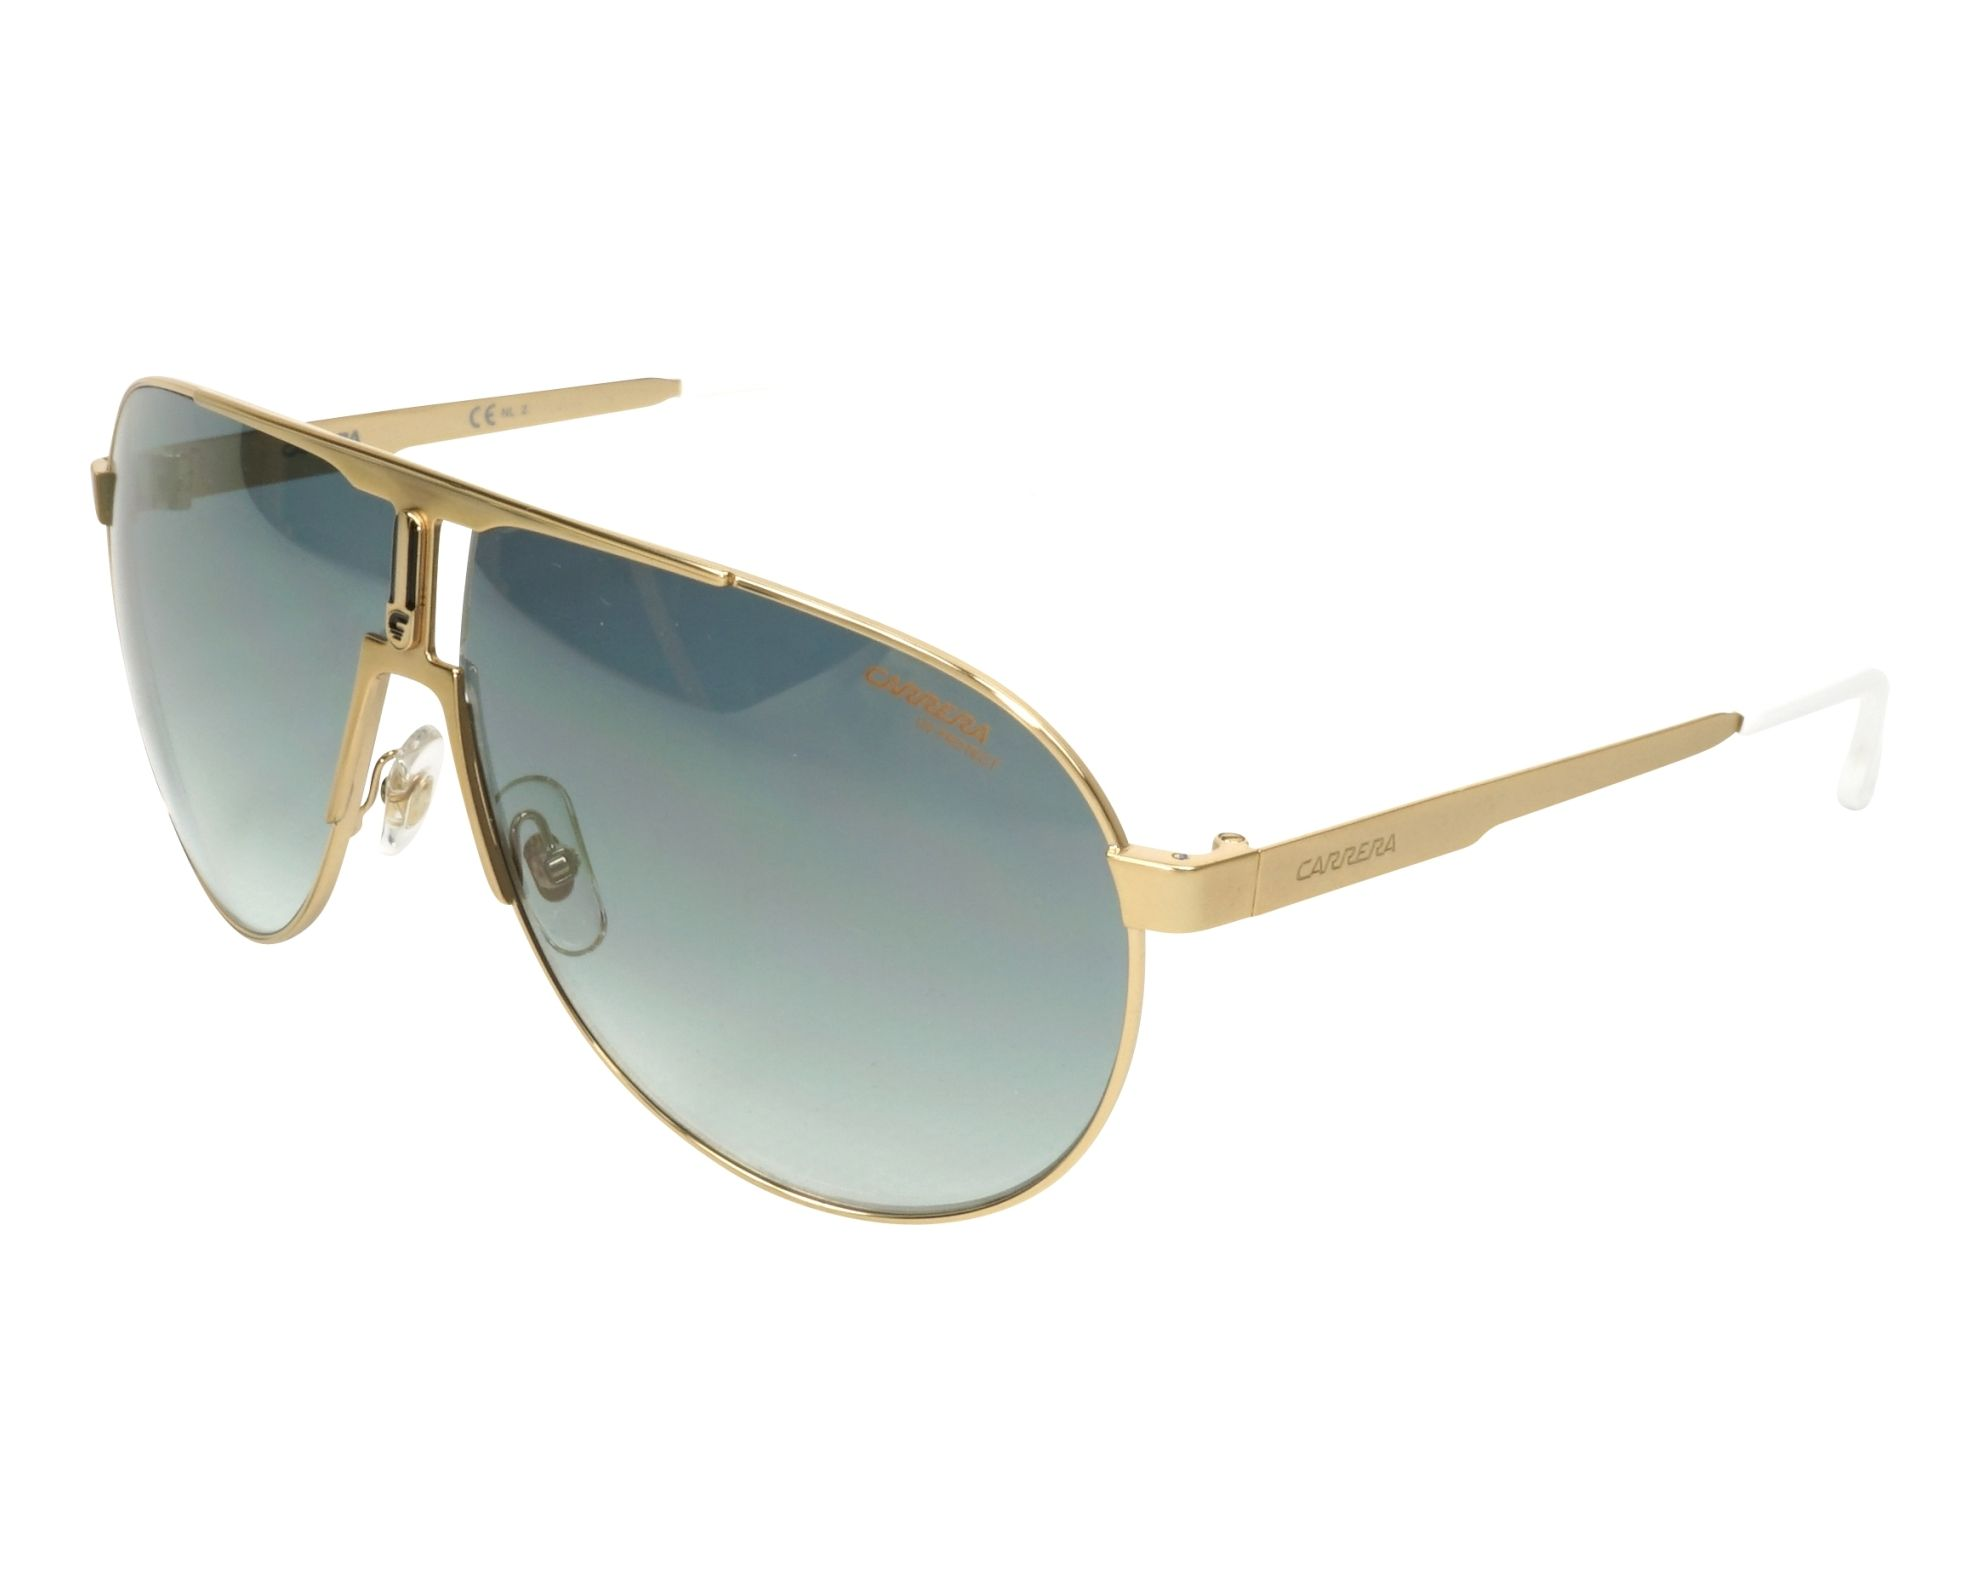 Sunglasses Carrera 1005-S J5G EZ 66-9 Gold profile view 050325d5dd